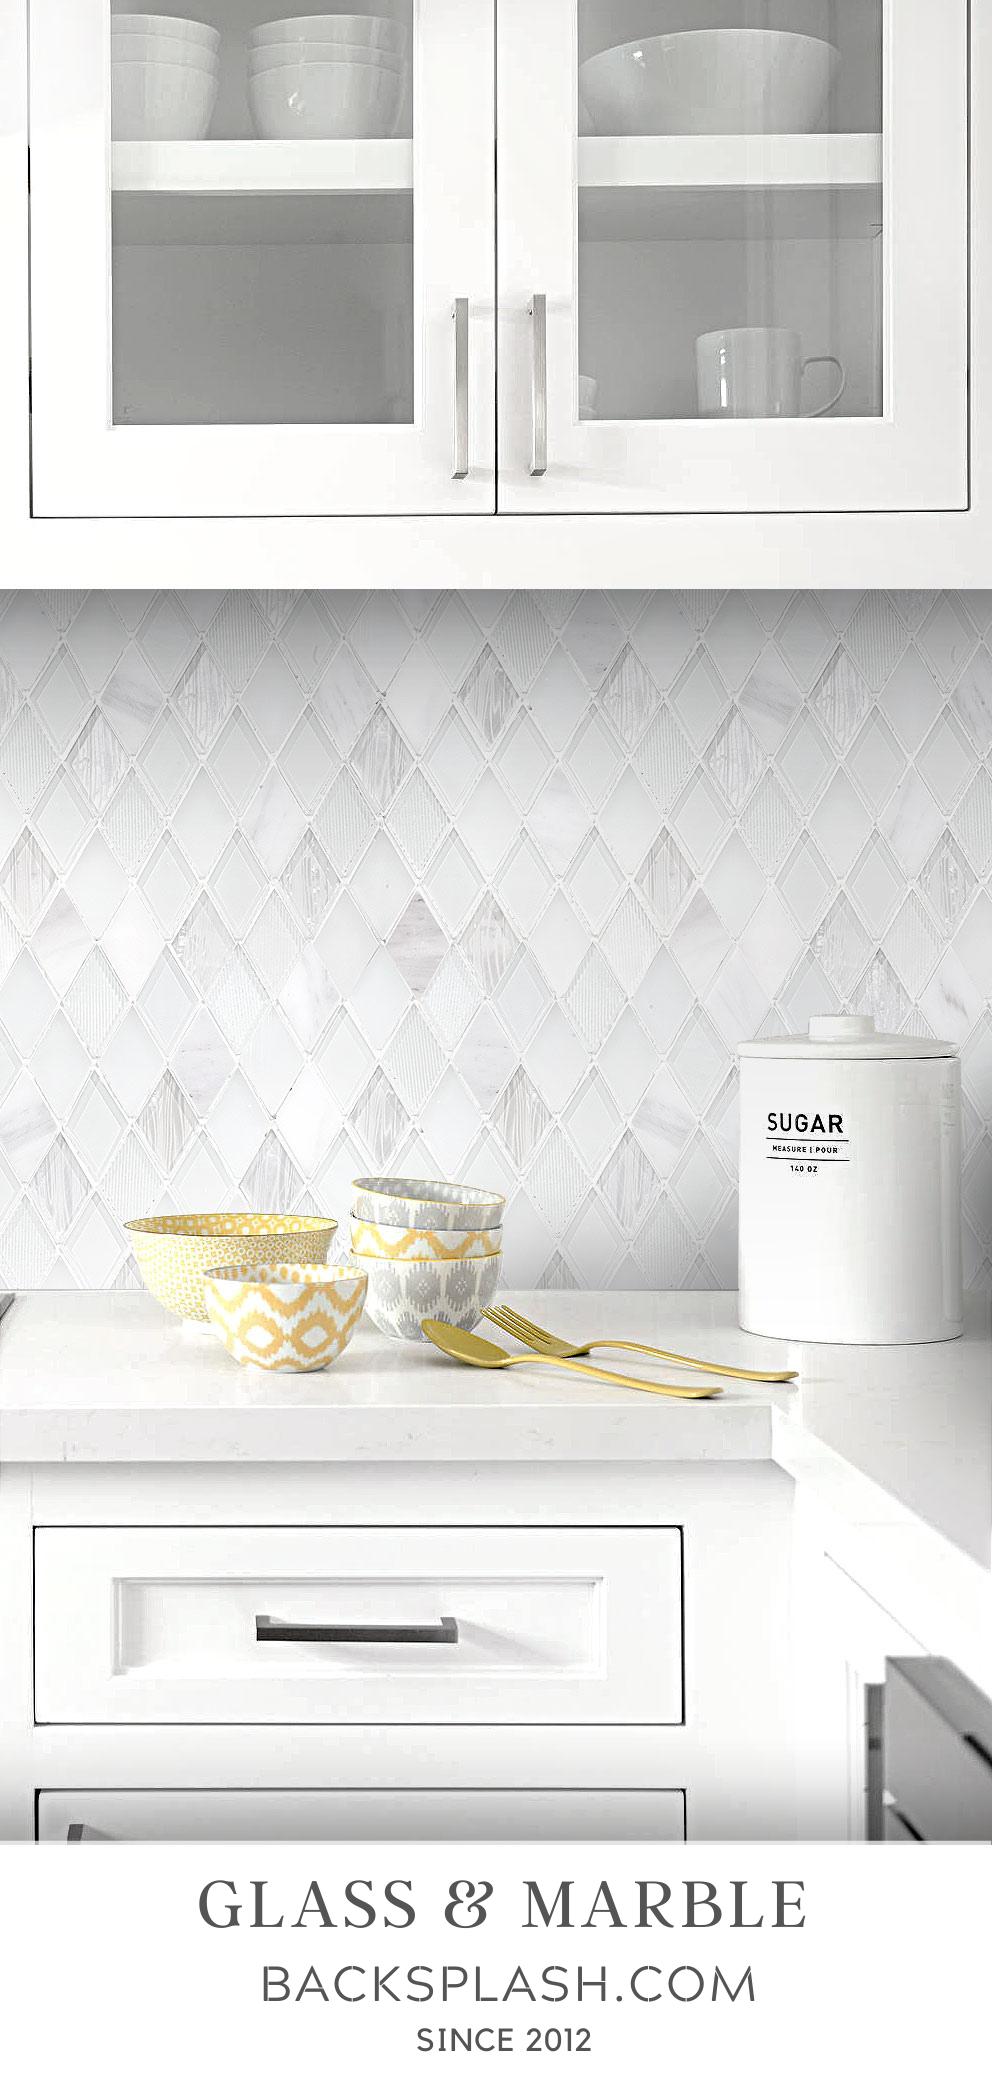 White Glass Marble Backsplash Tile Luxury Look Backsplash Glass Luxury Mar Kitchen Backsplash Designs White Tile Backsplash Backsplash For White Cabinets